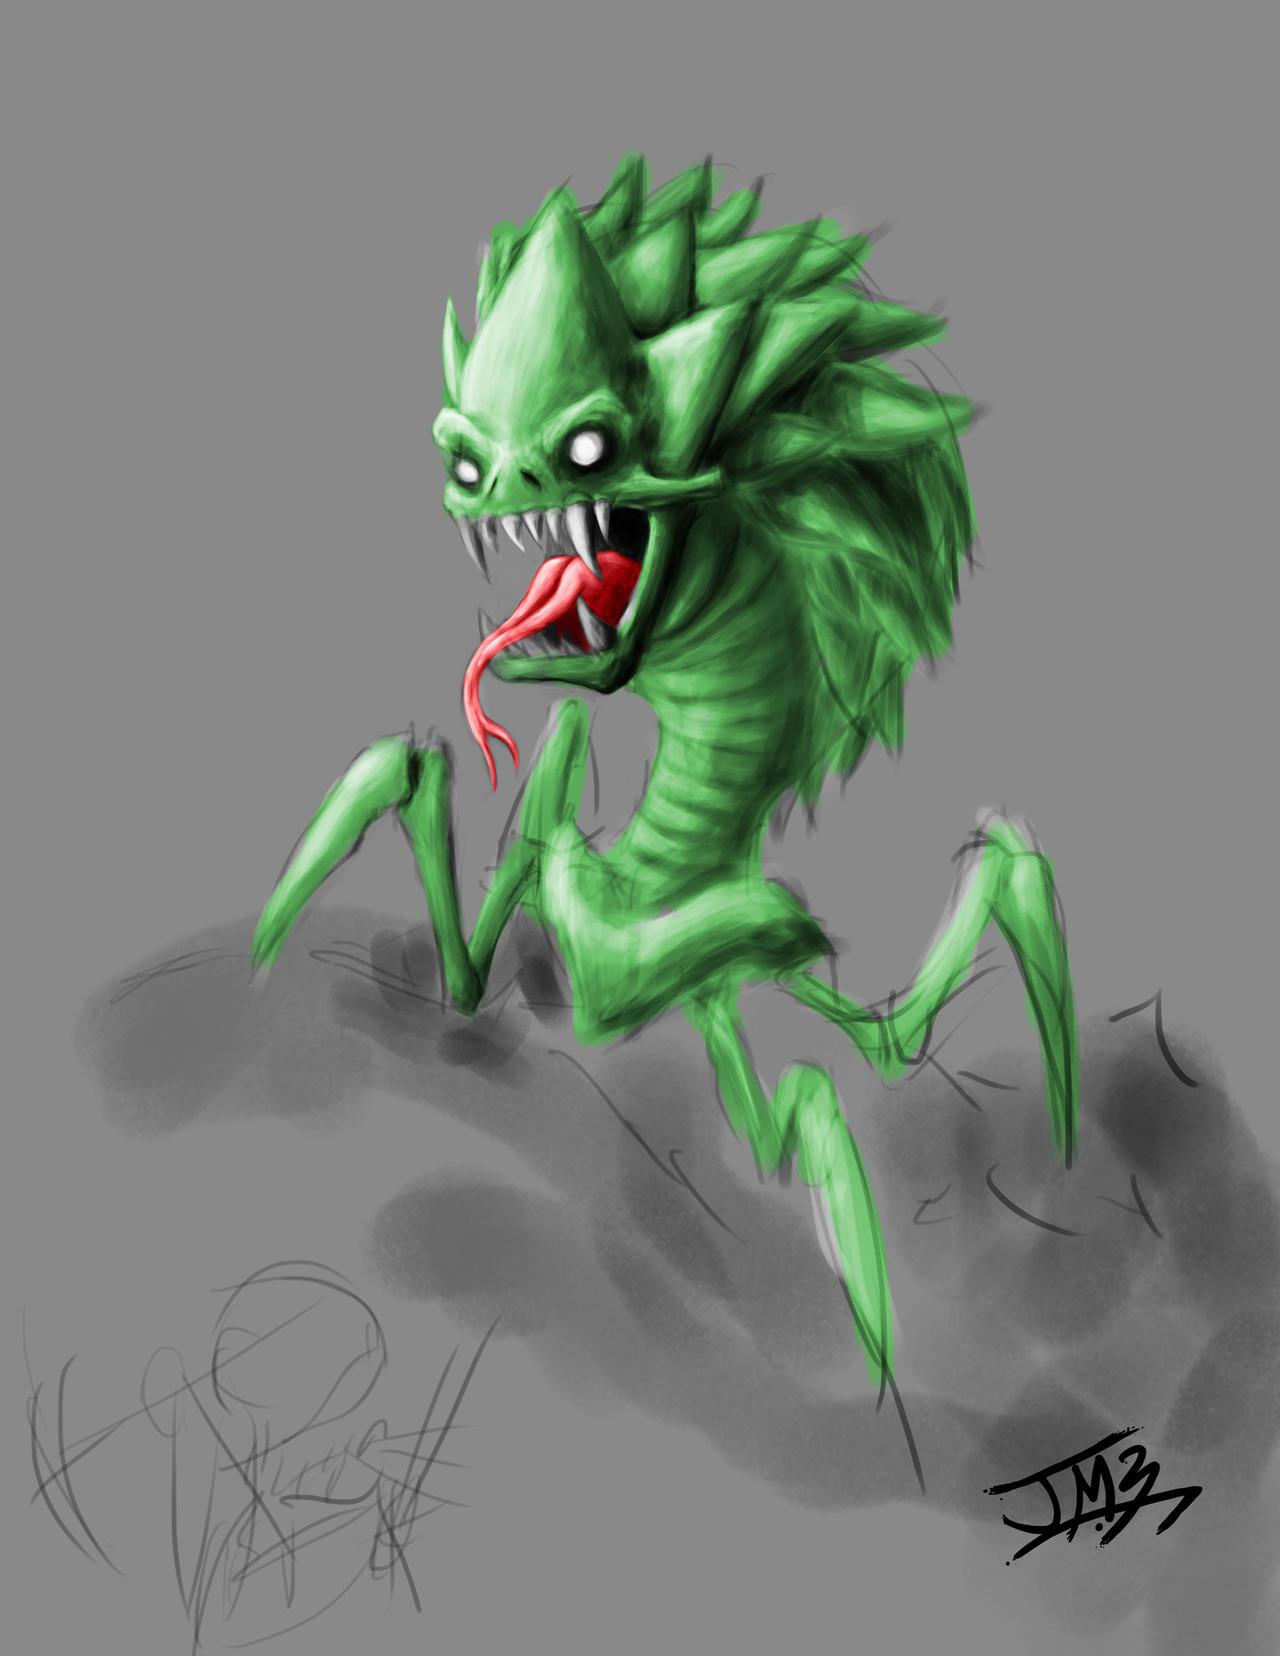 Minecraft Creeper by Myrdah